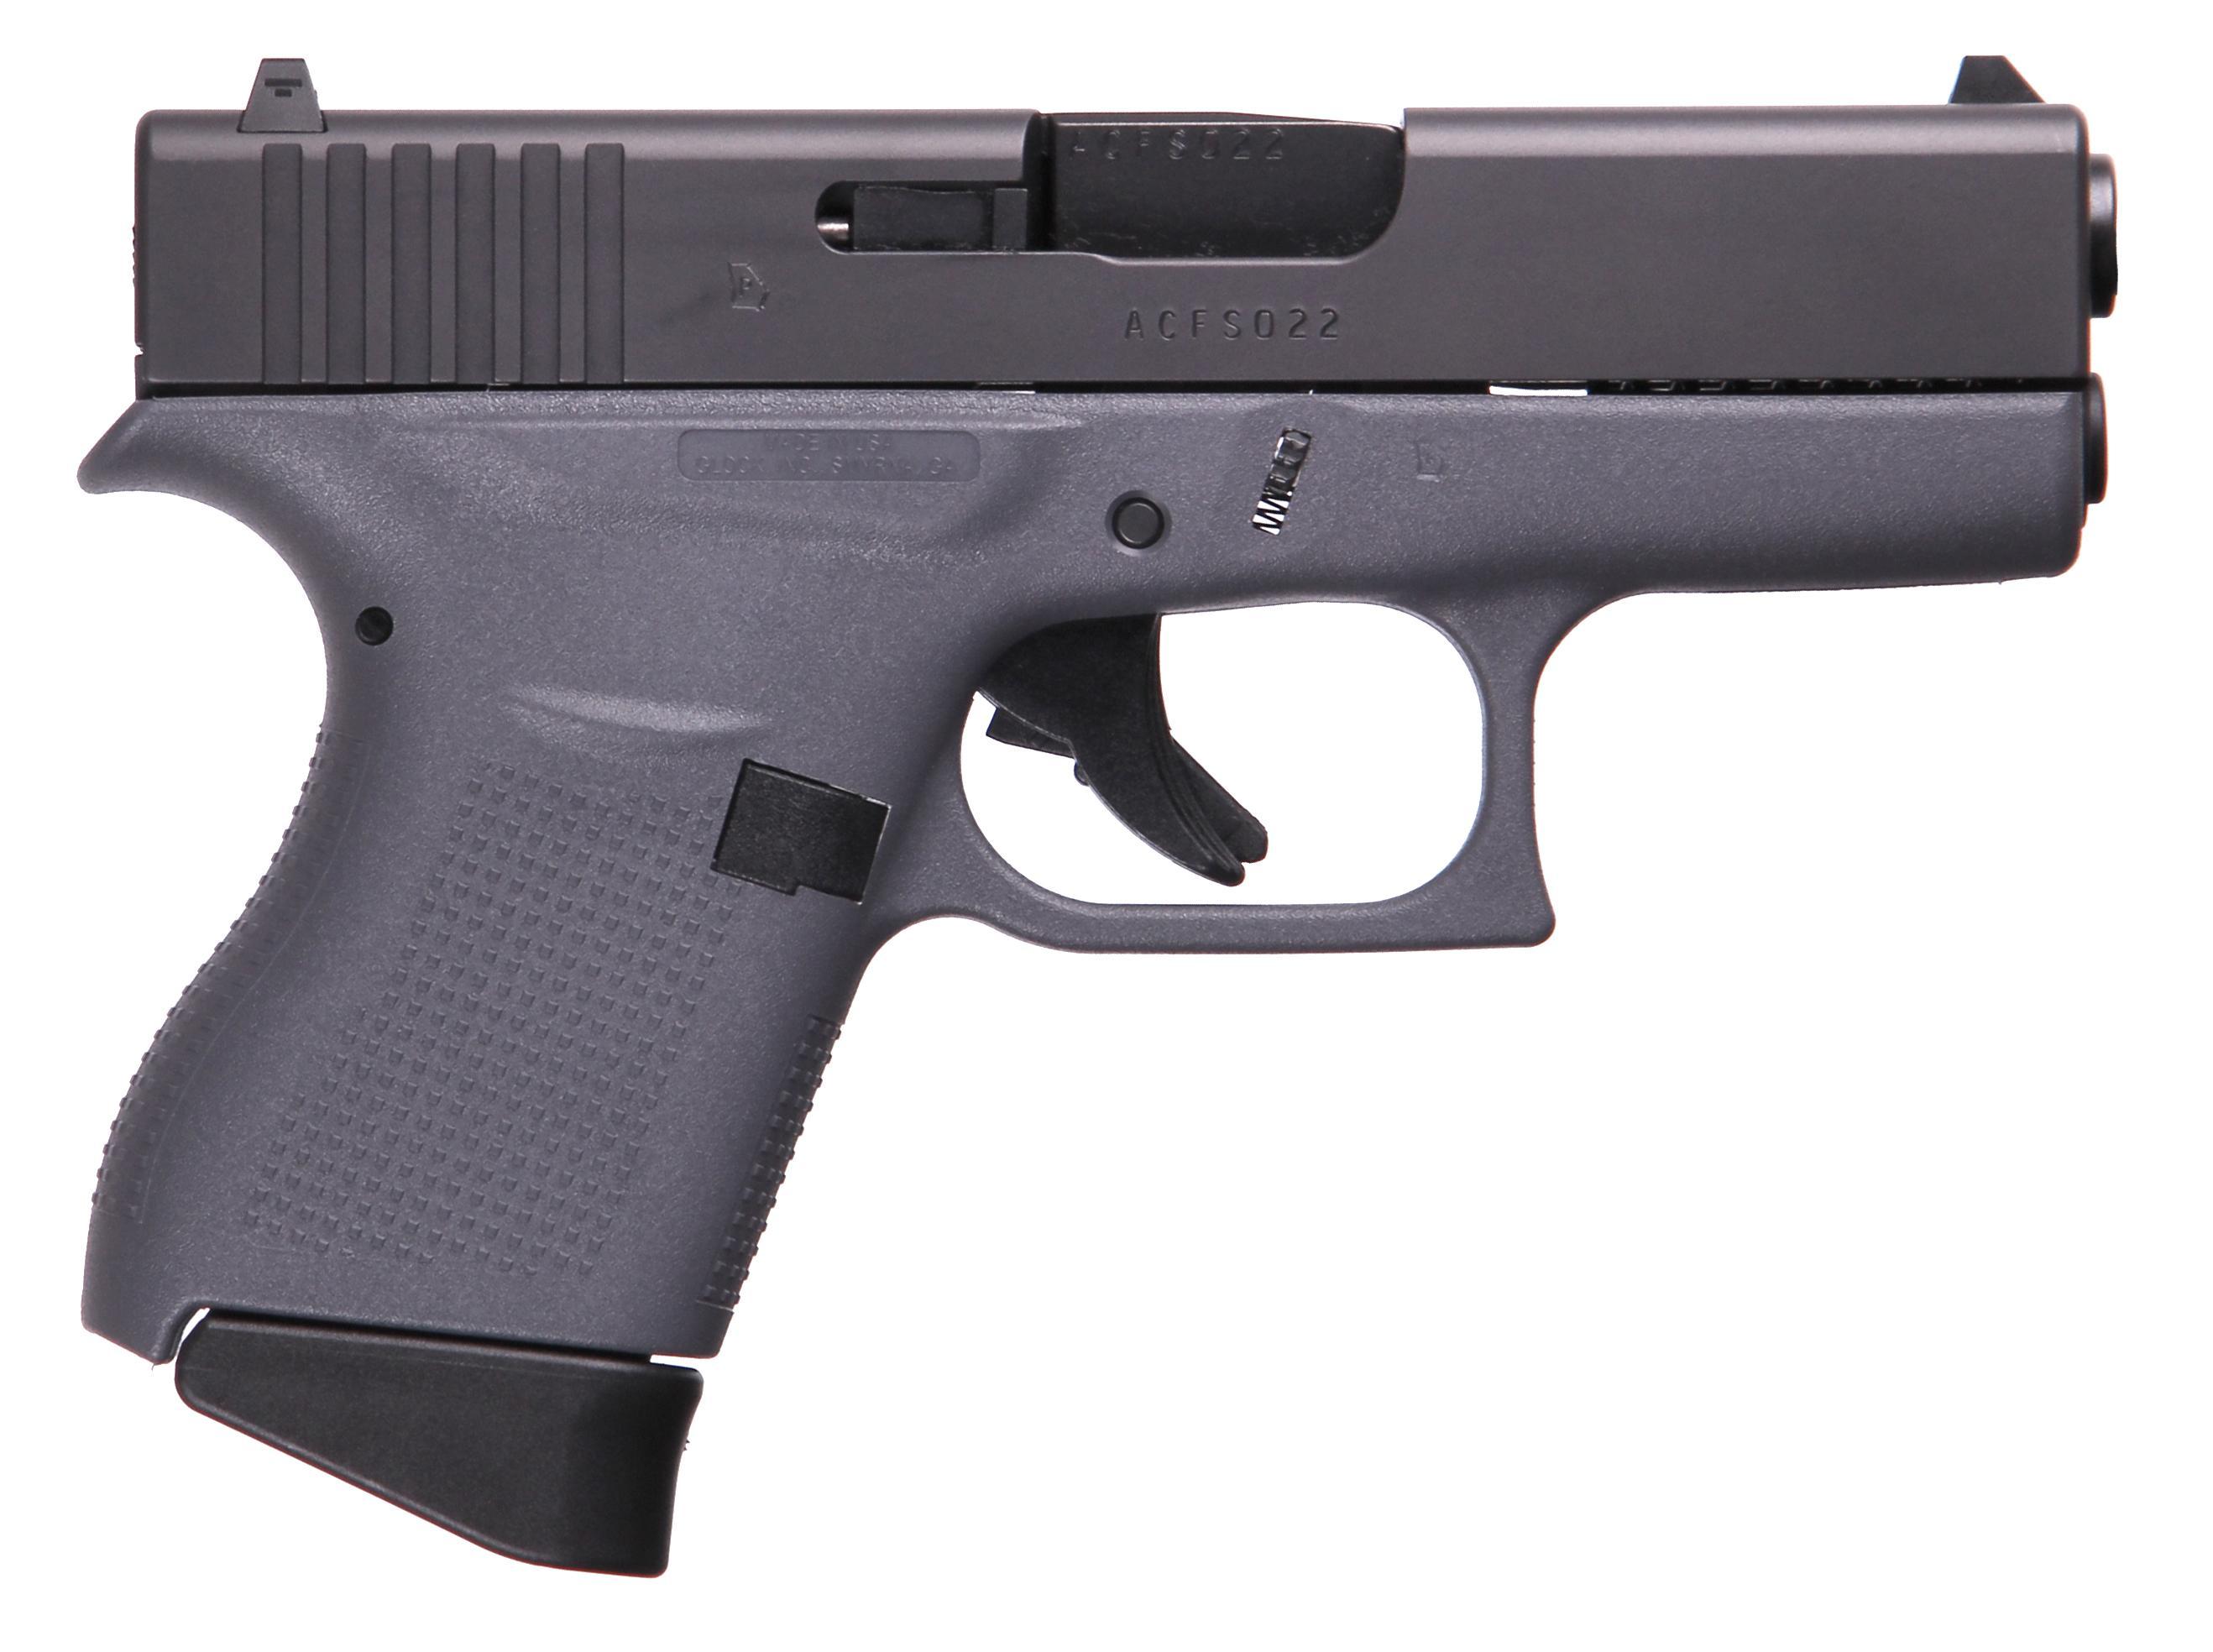 G43 G3 GRAY 9MM 6+1 3.39 FS - TWO 6RD MAGAZINES